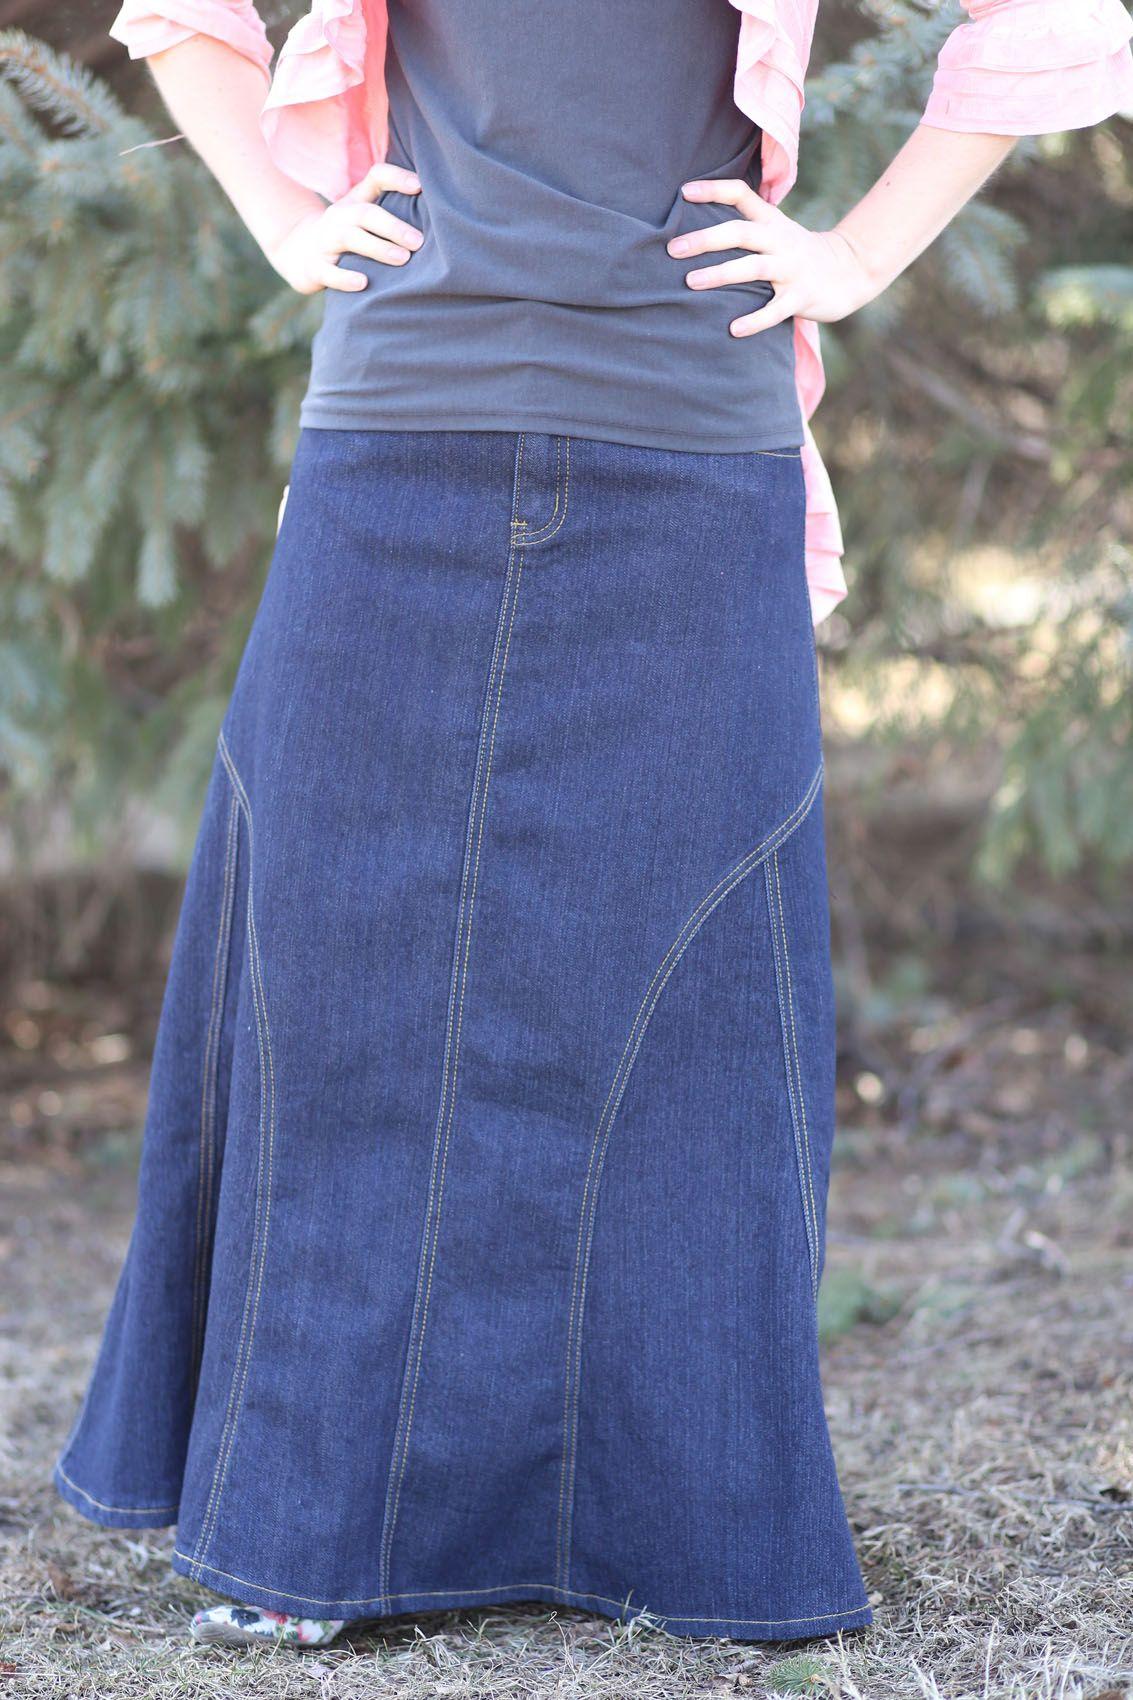 e63df5e241 Darling Denim Indigo Modest Skirt | Long Jean Skirt Plus Size 20 ...